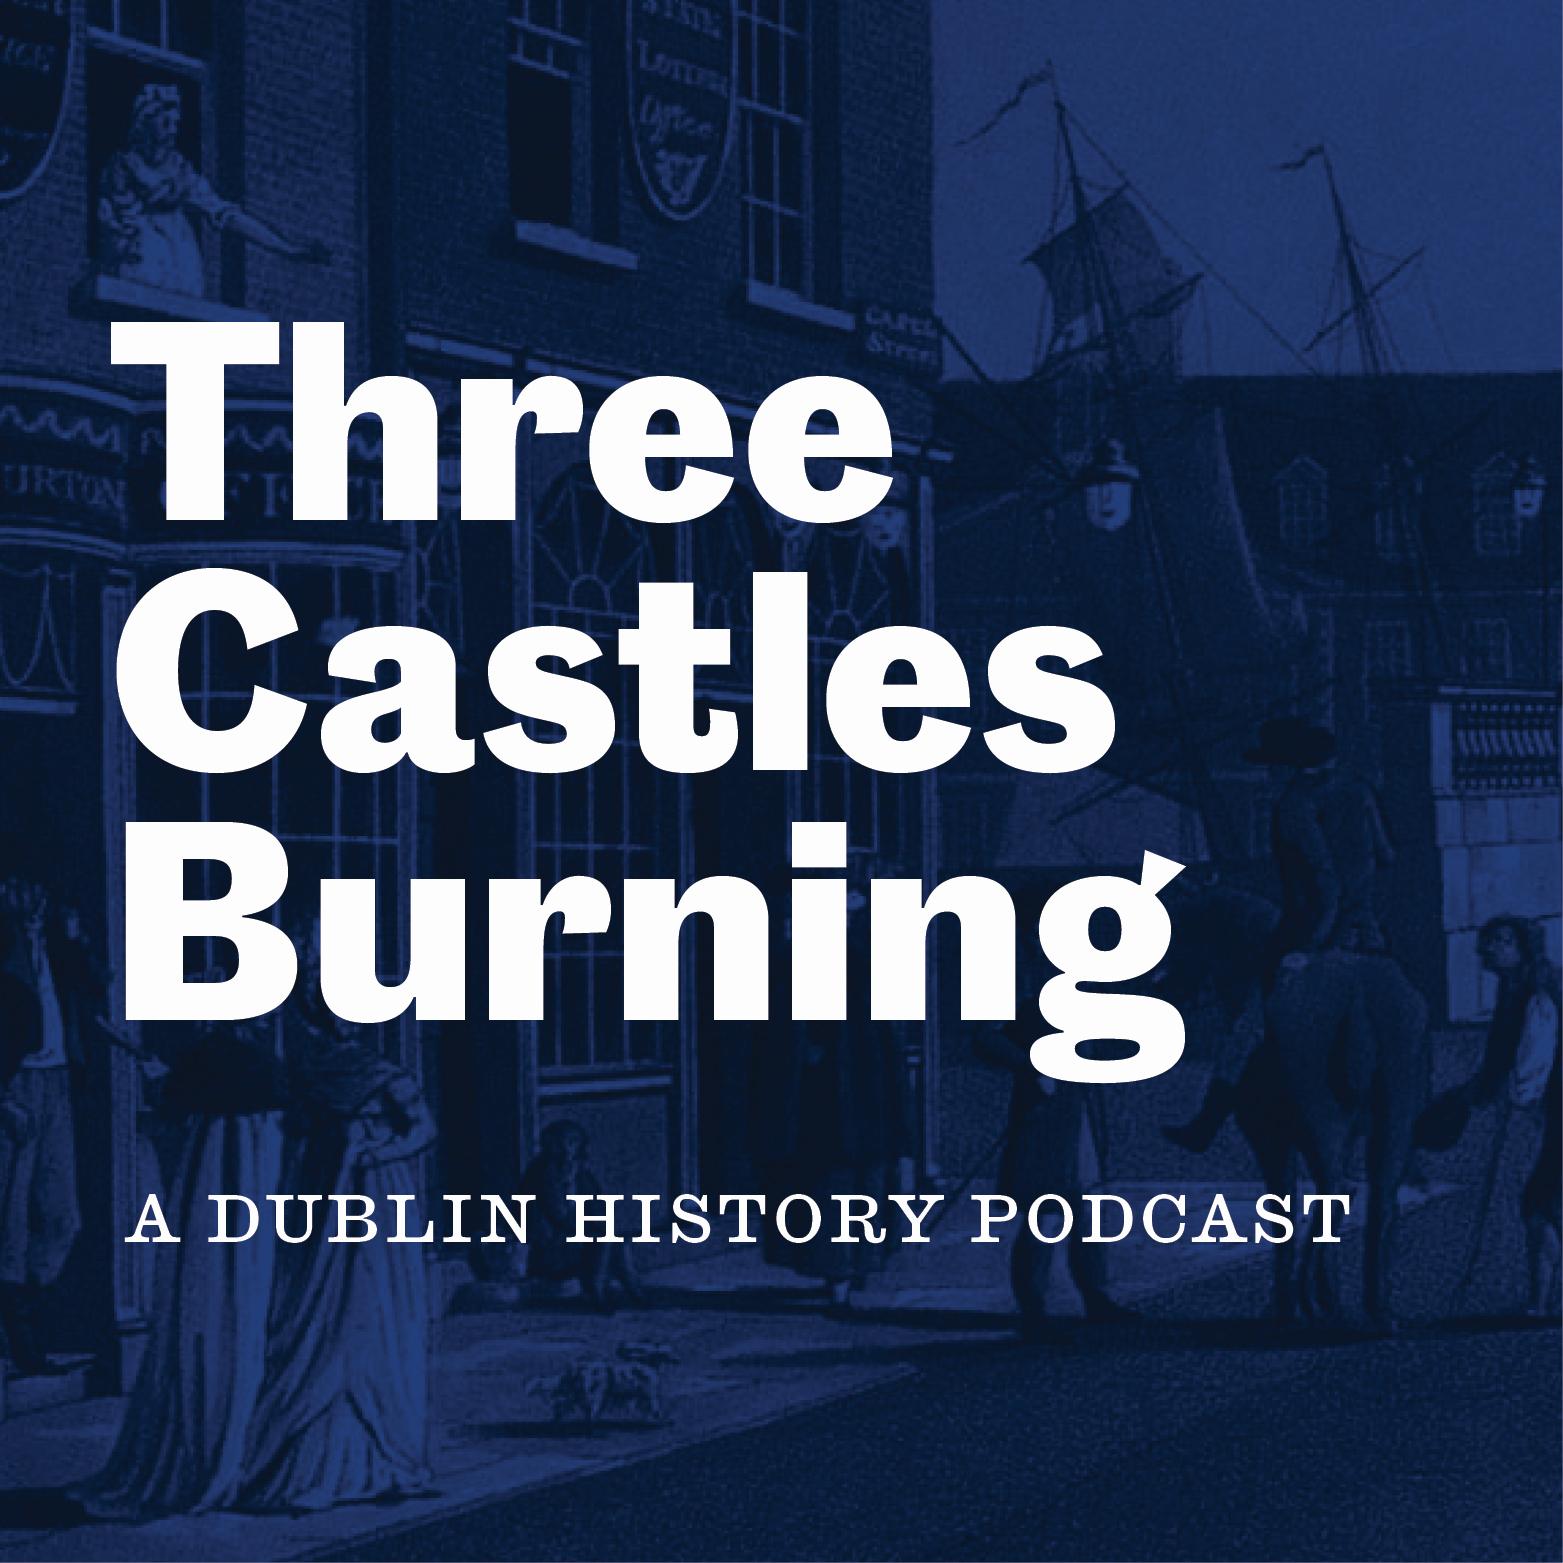 Three Castles Burning show art